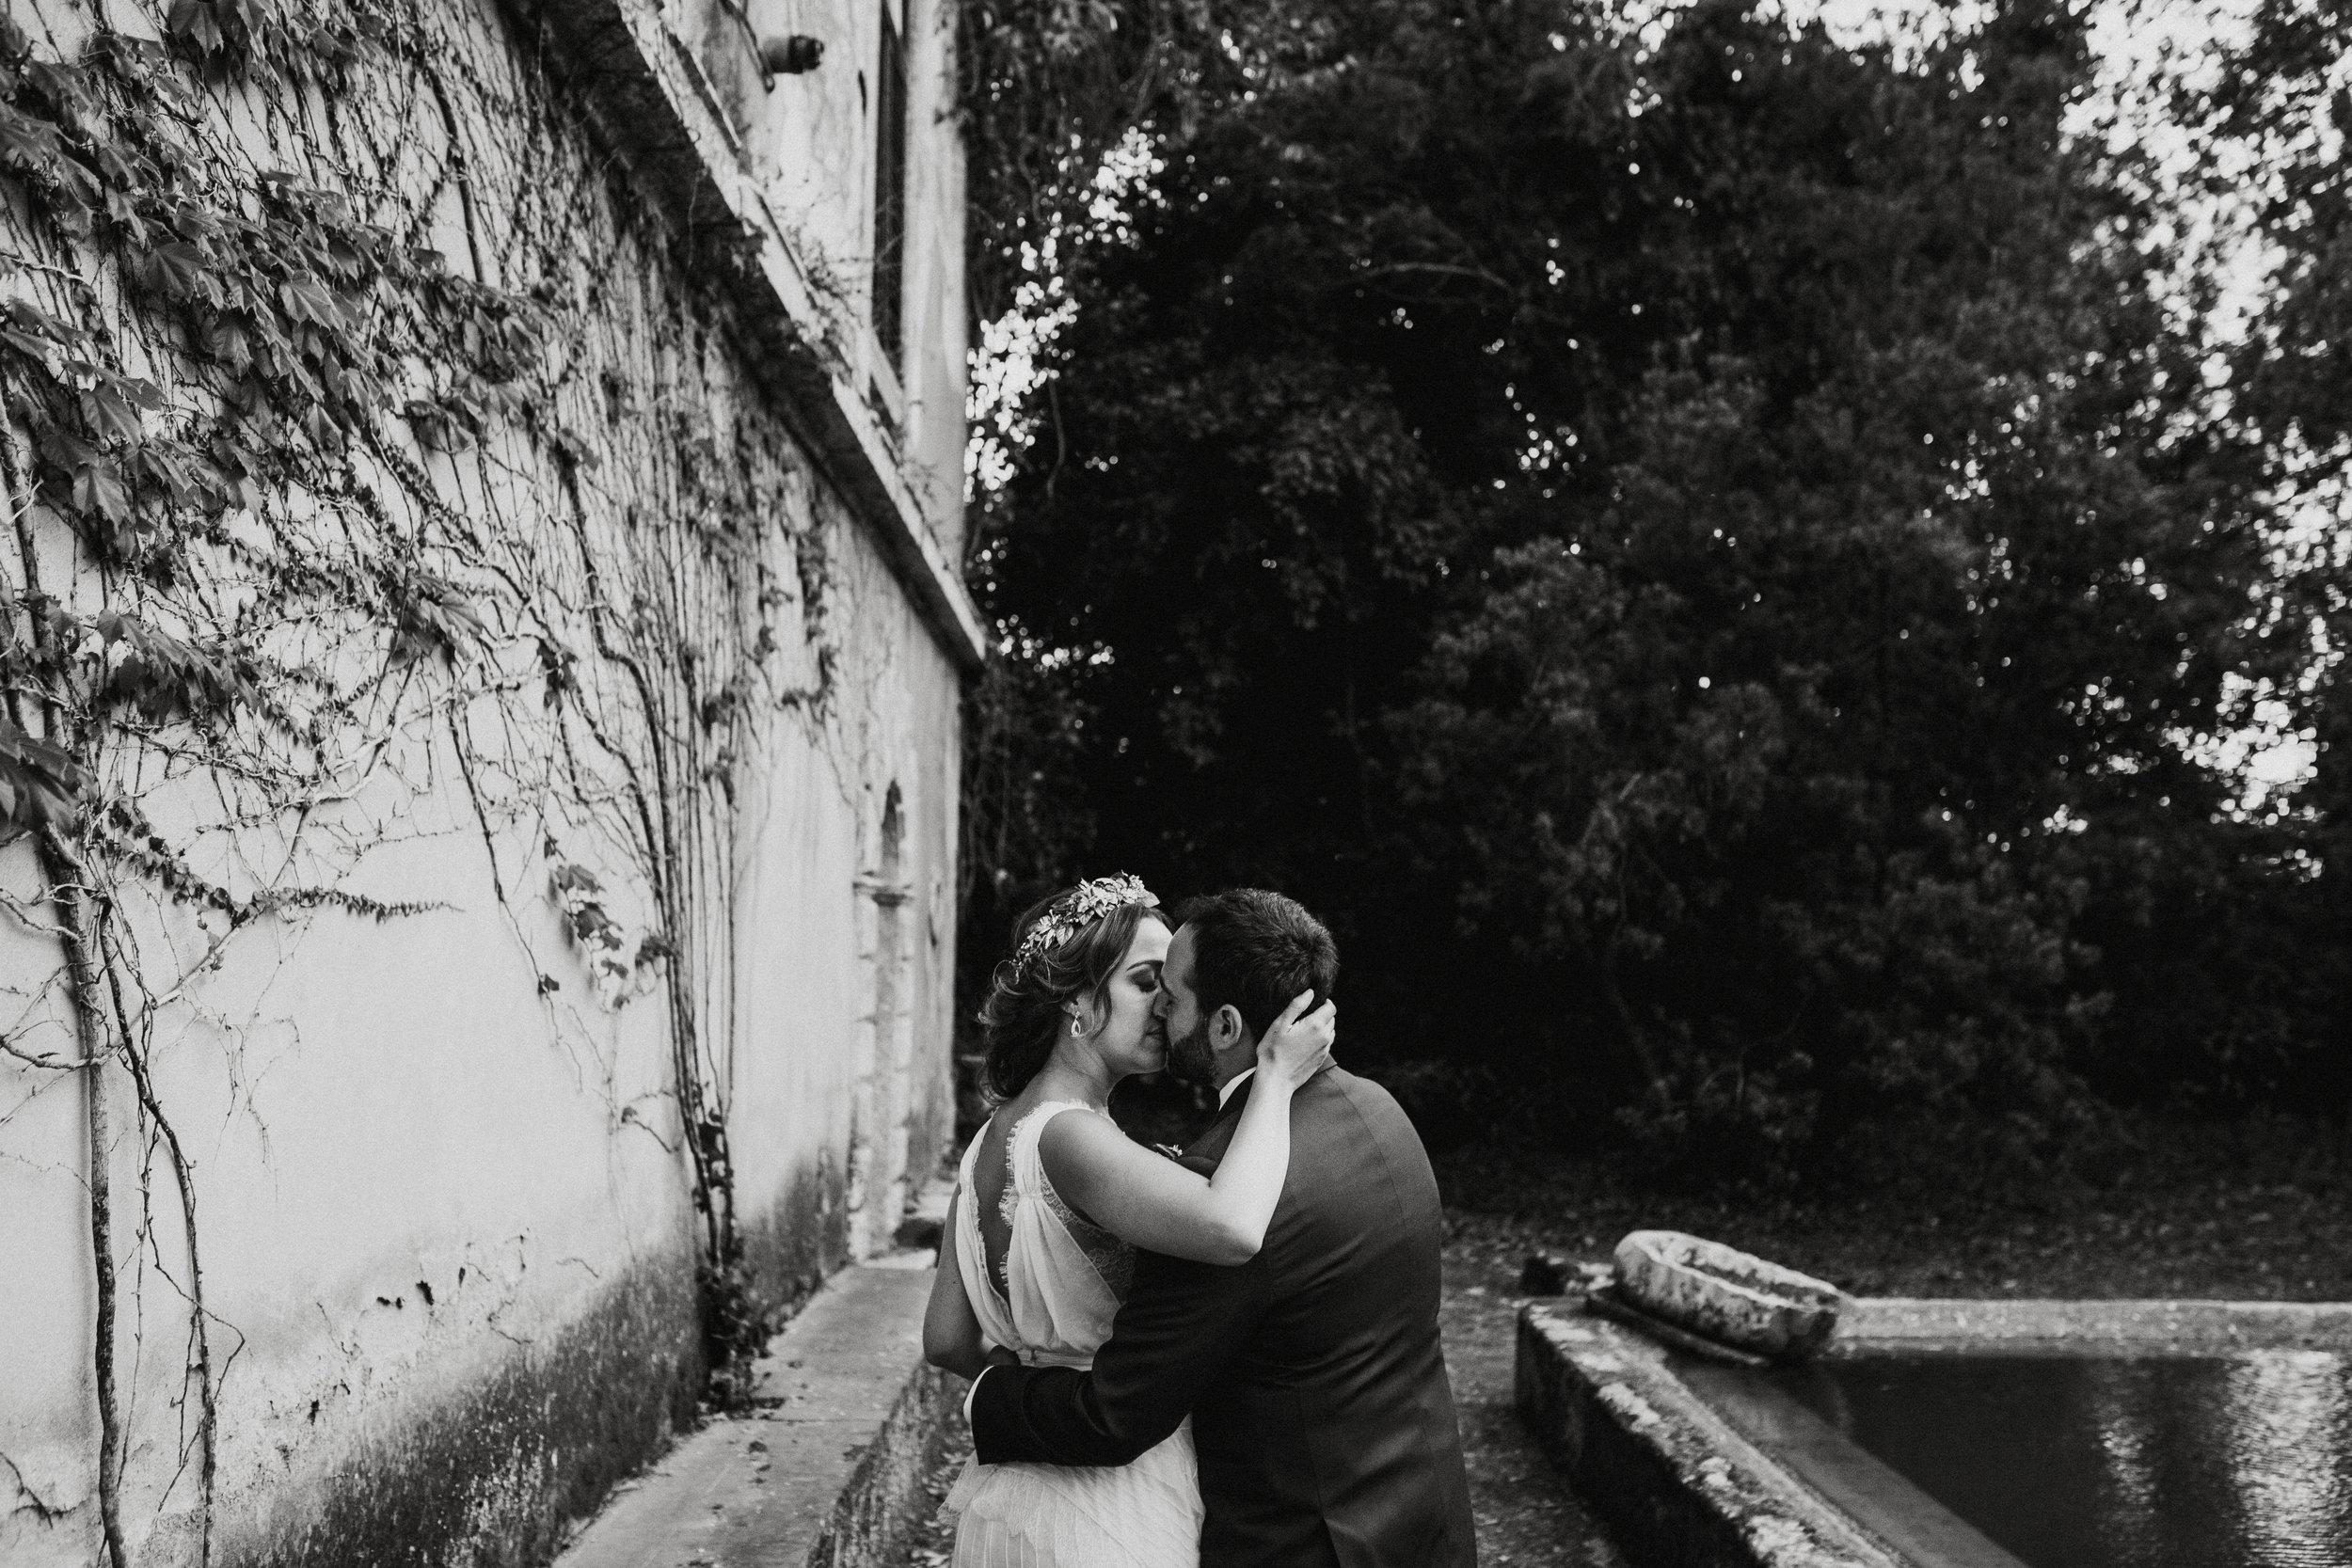 R&J628_ 09 setembro 2017 Wedding day_.jpg